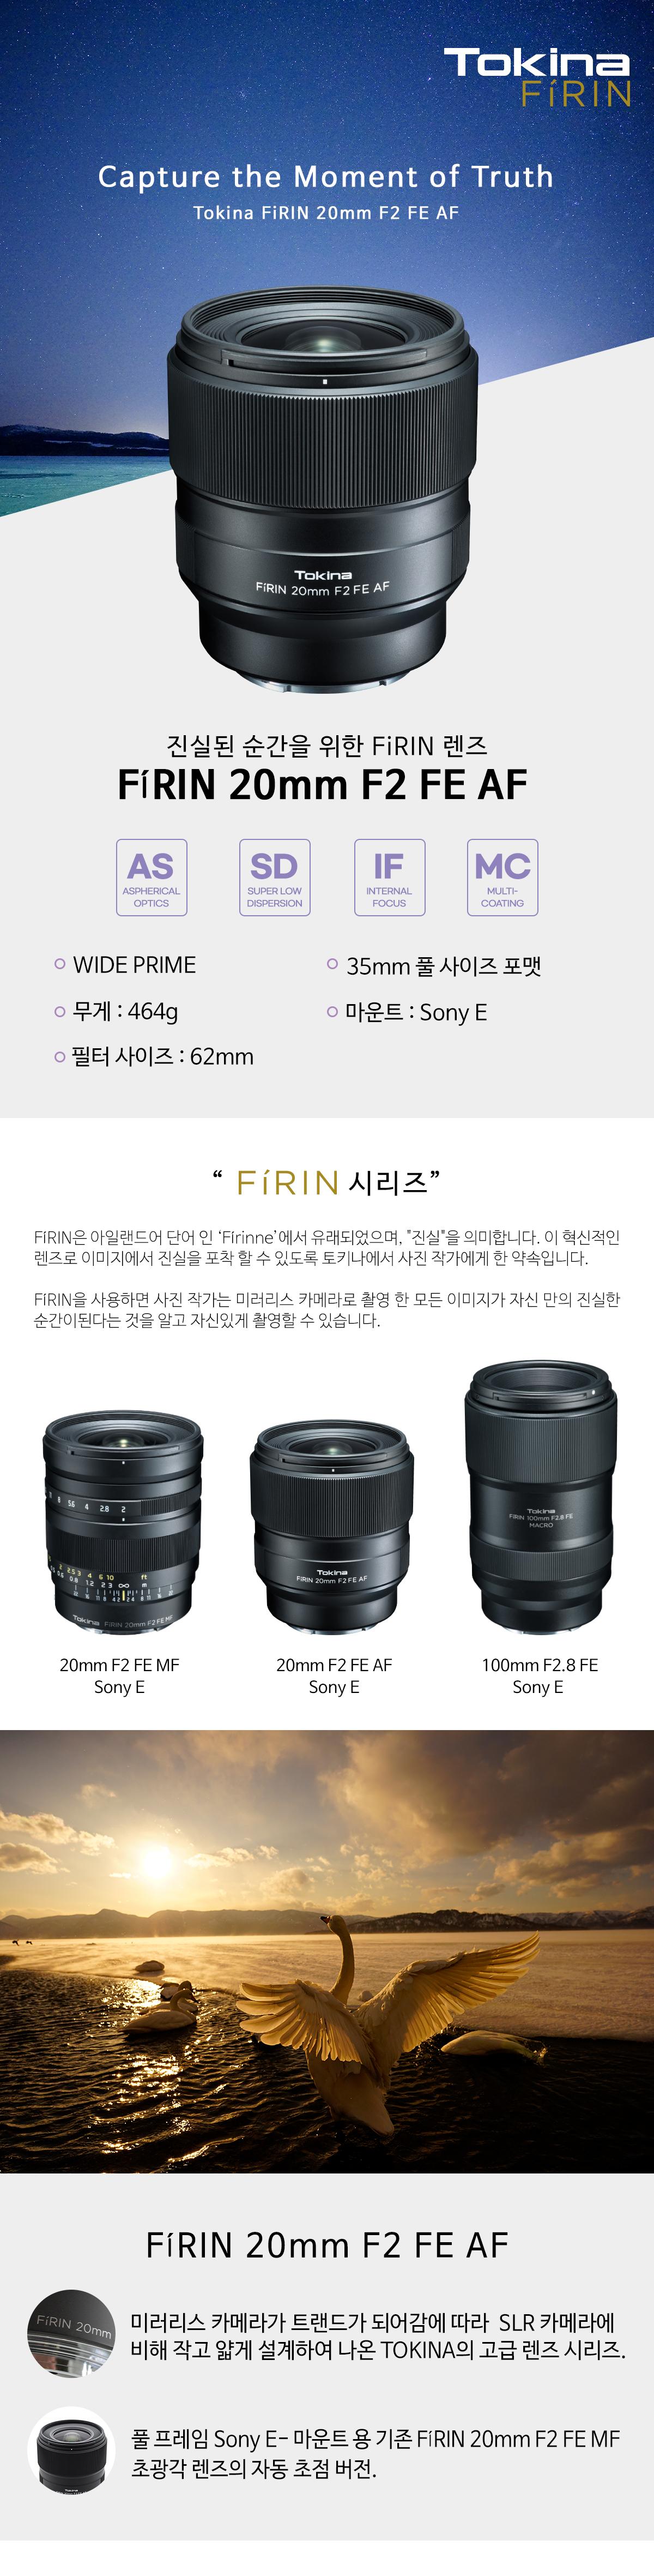 Tokina-FiRIN-20mm-F2-FE-AF-01.jpg